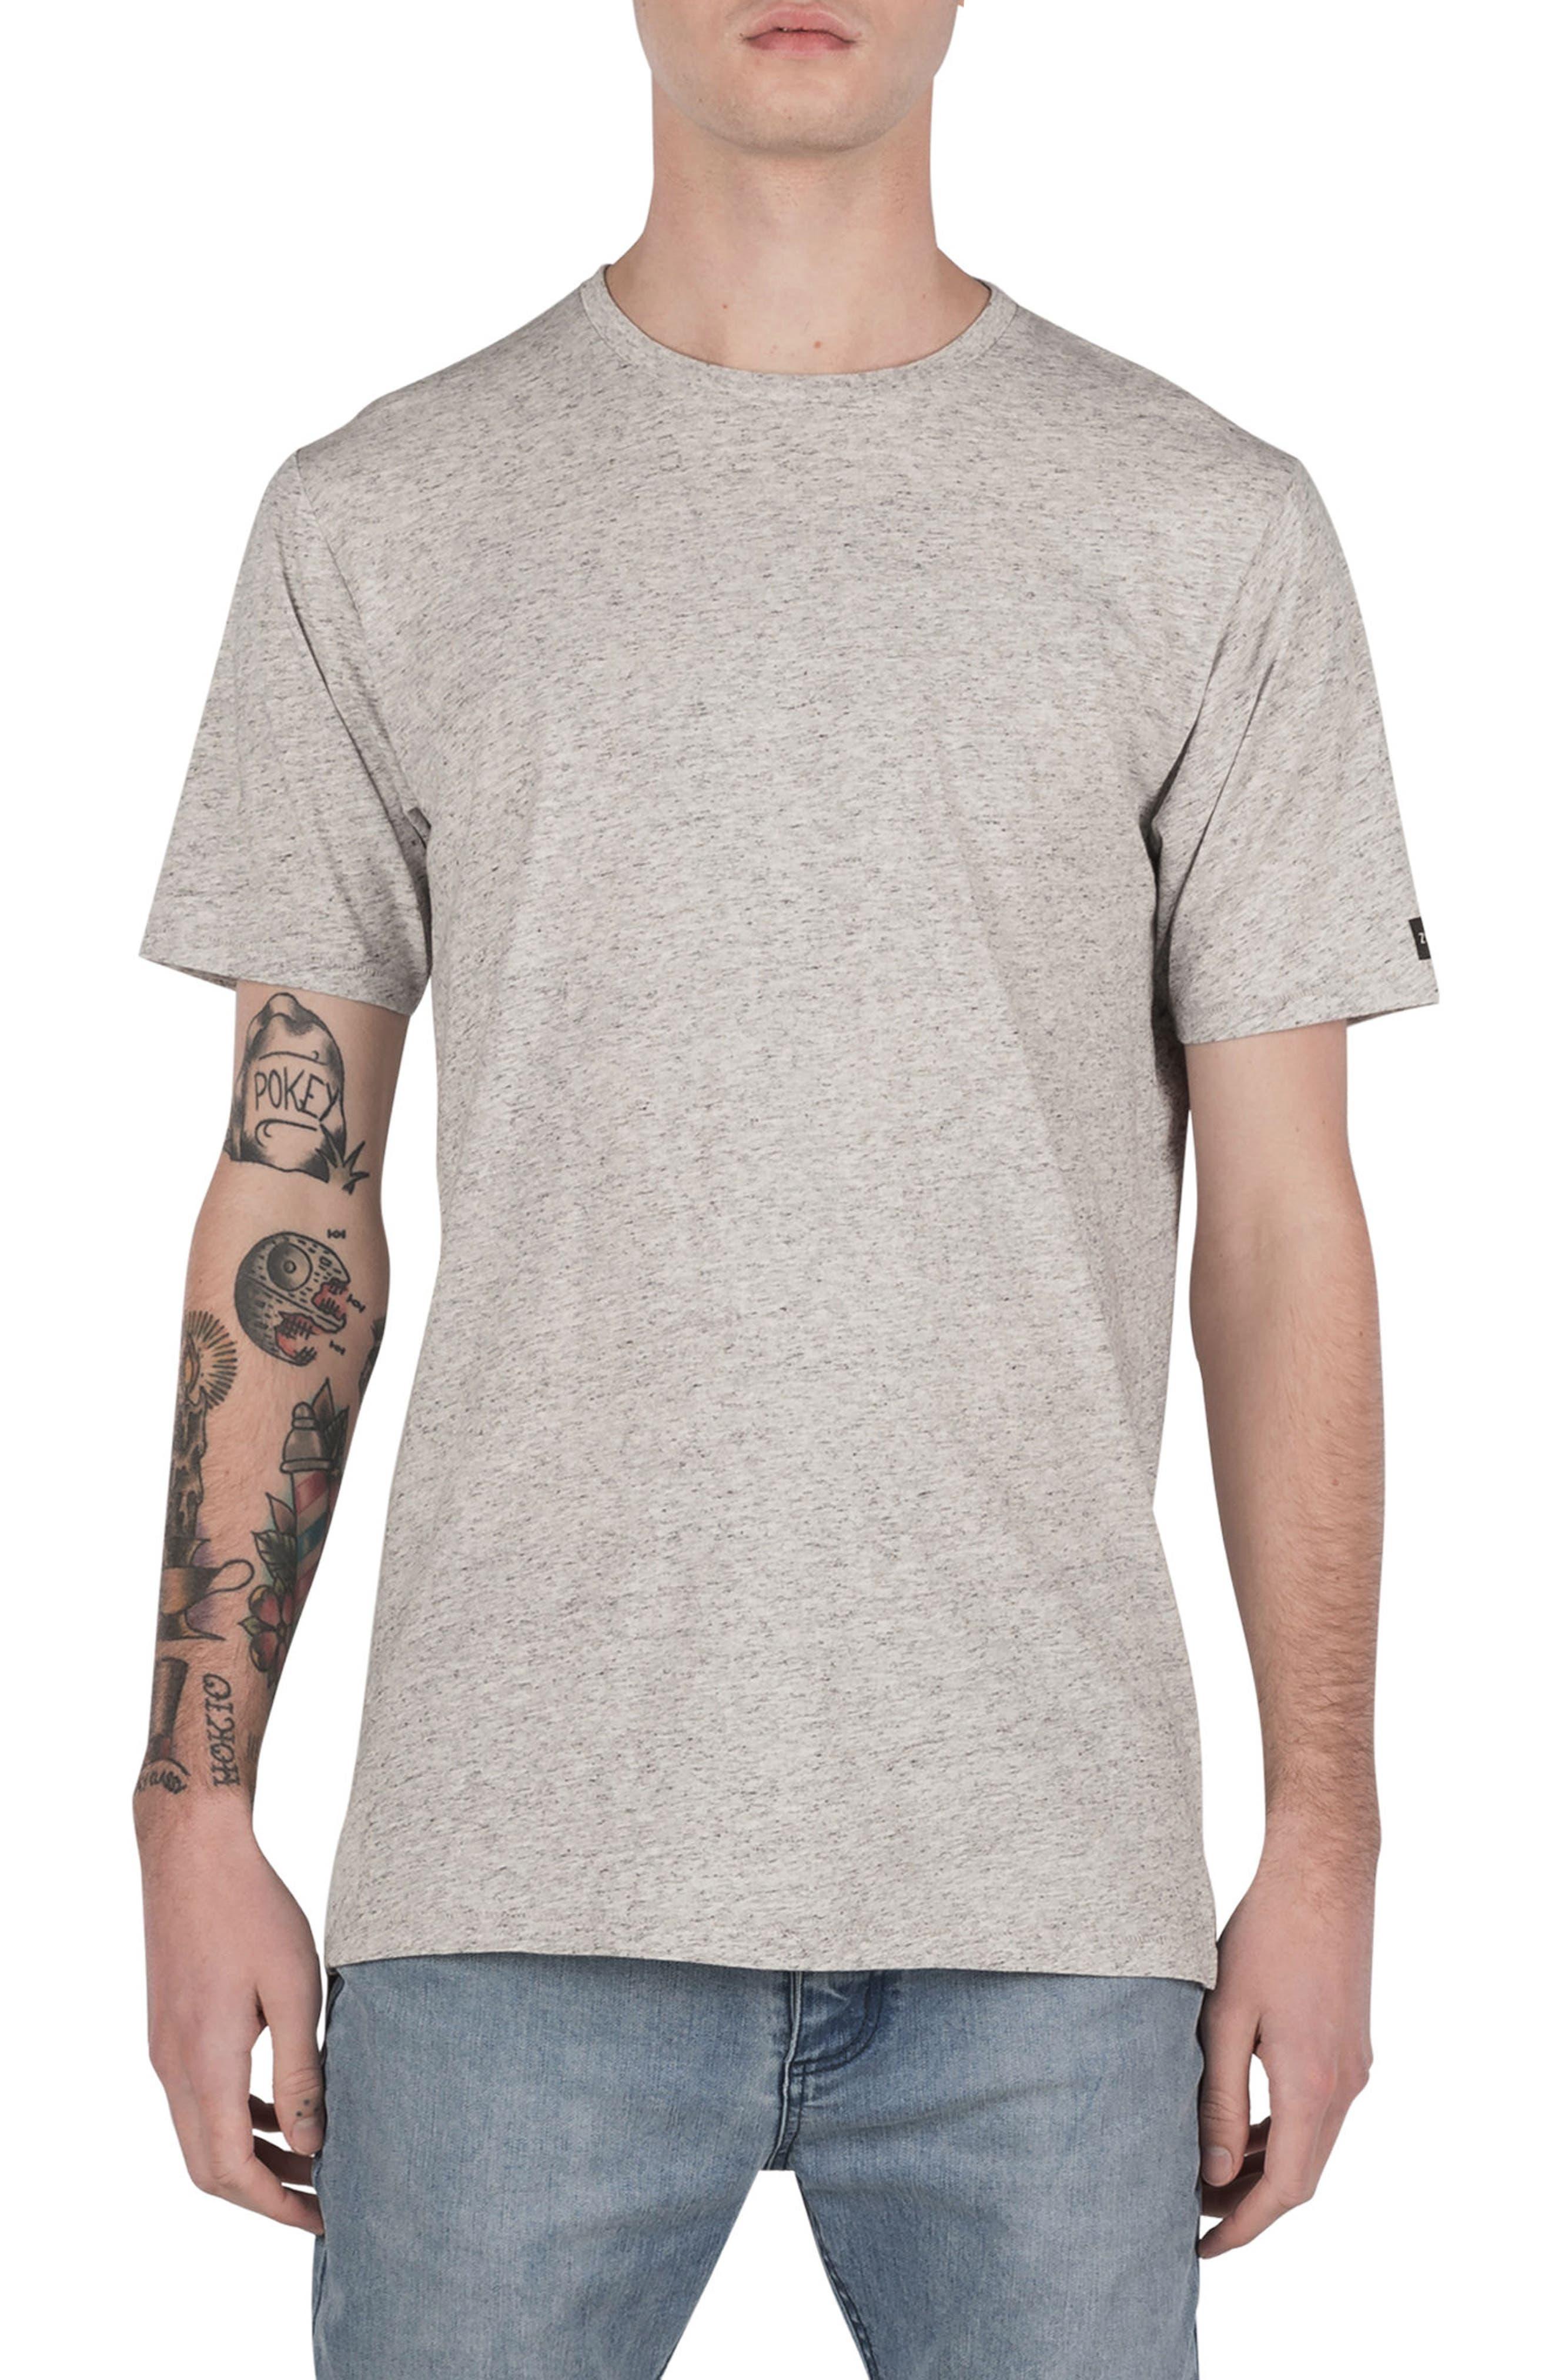 Flintlock T-Shirt,                         Main,                         color, 060